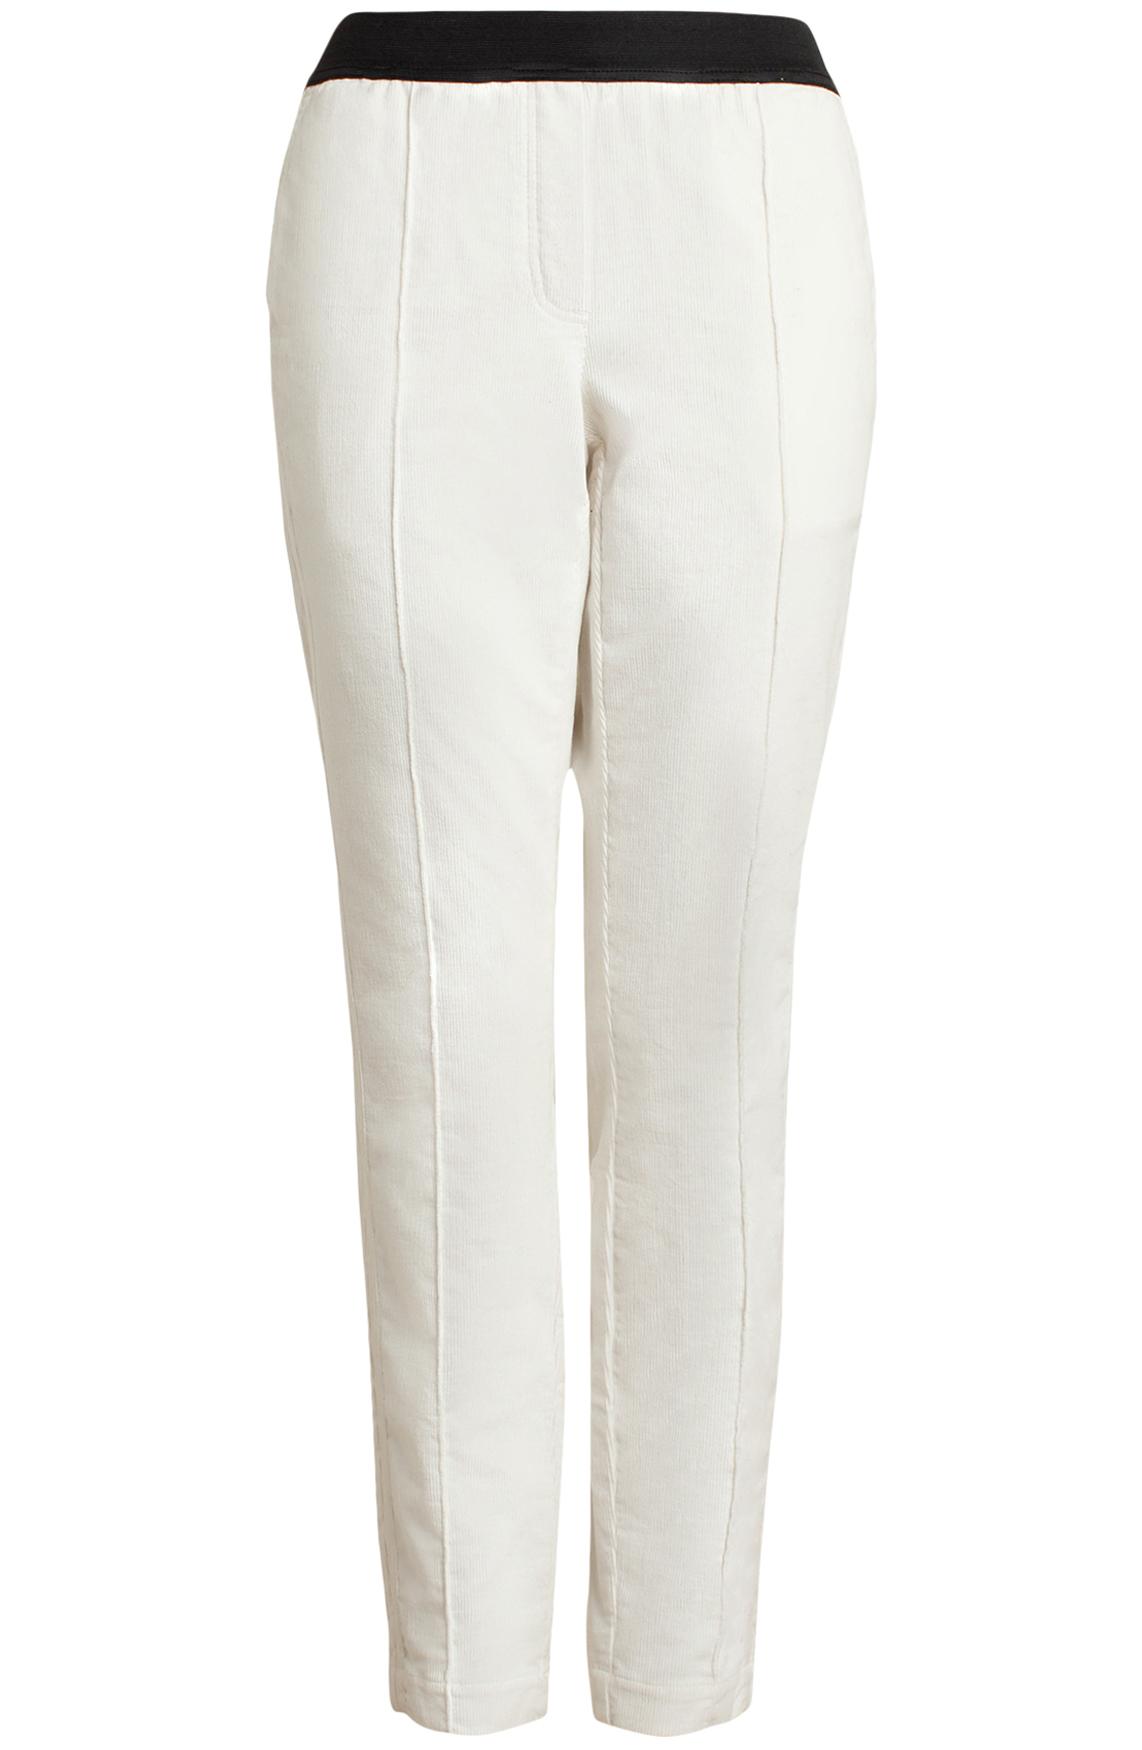 Anna Blue Dames Velvet broek wit